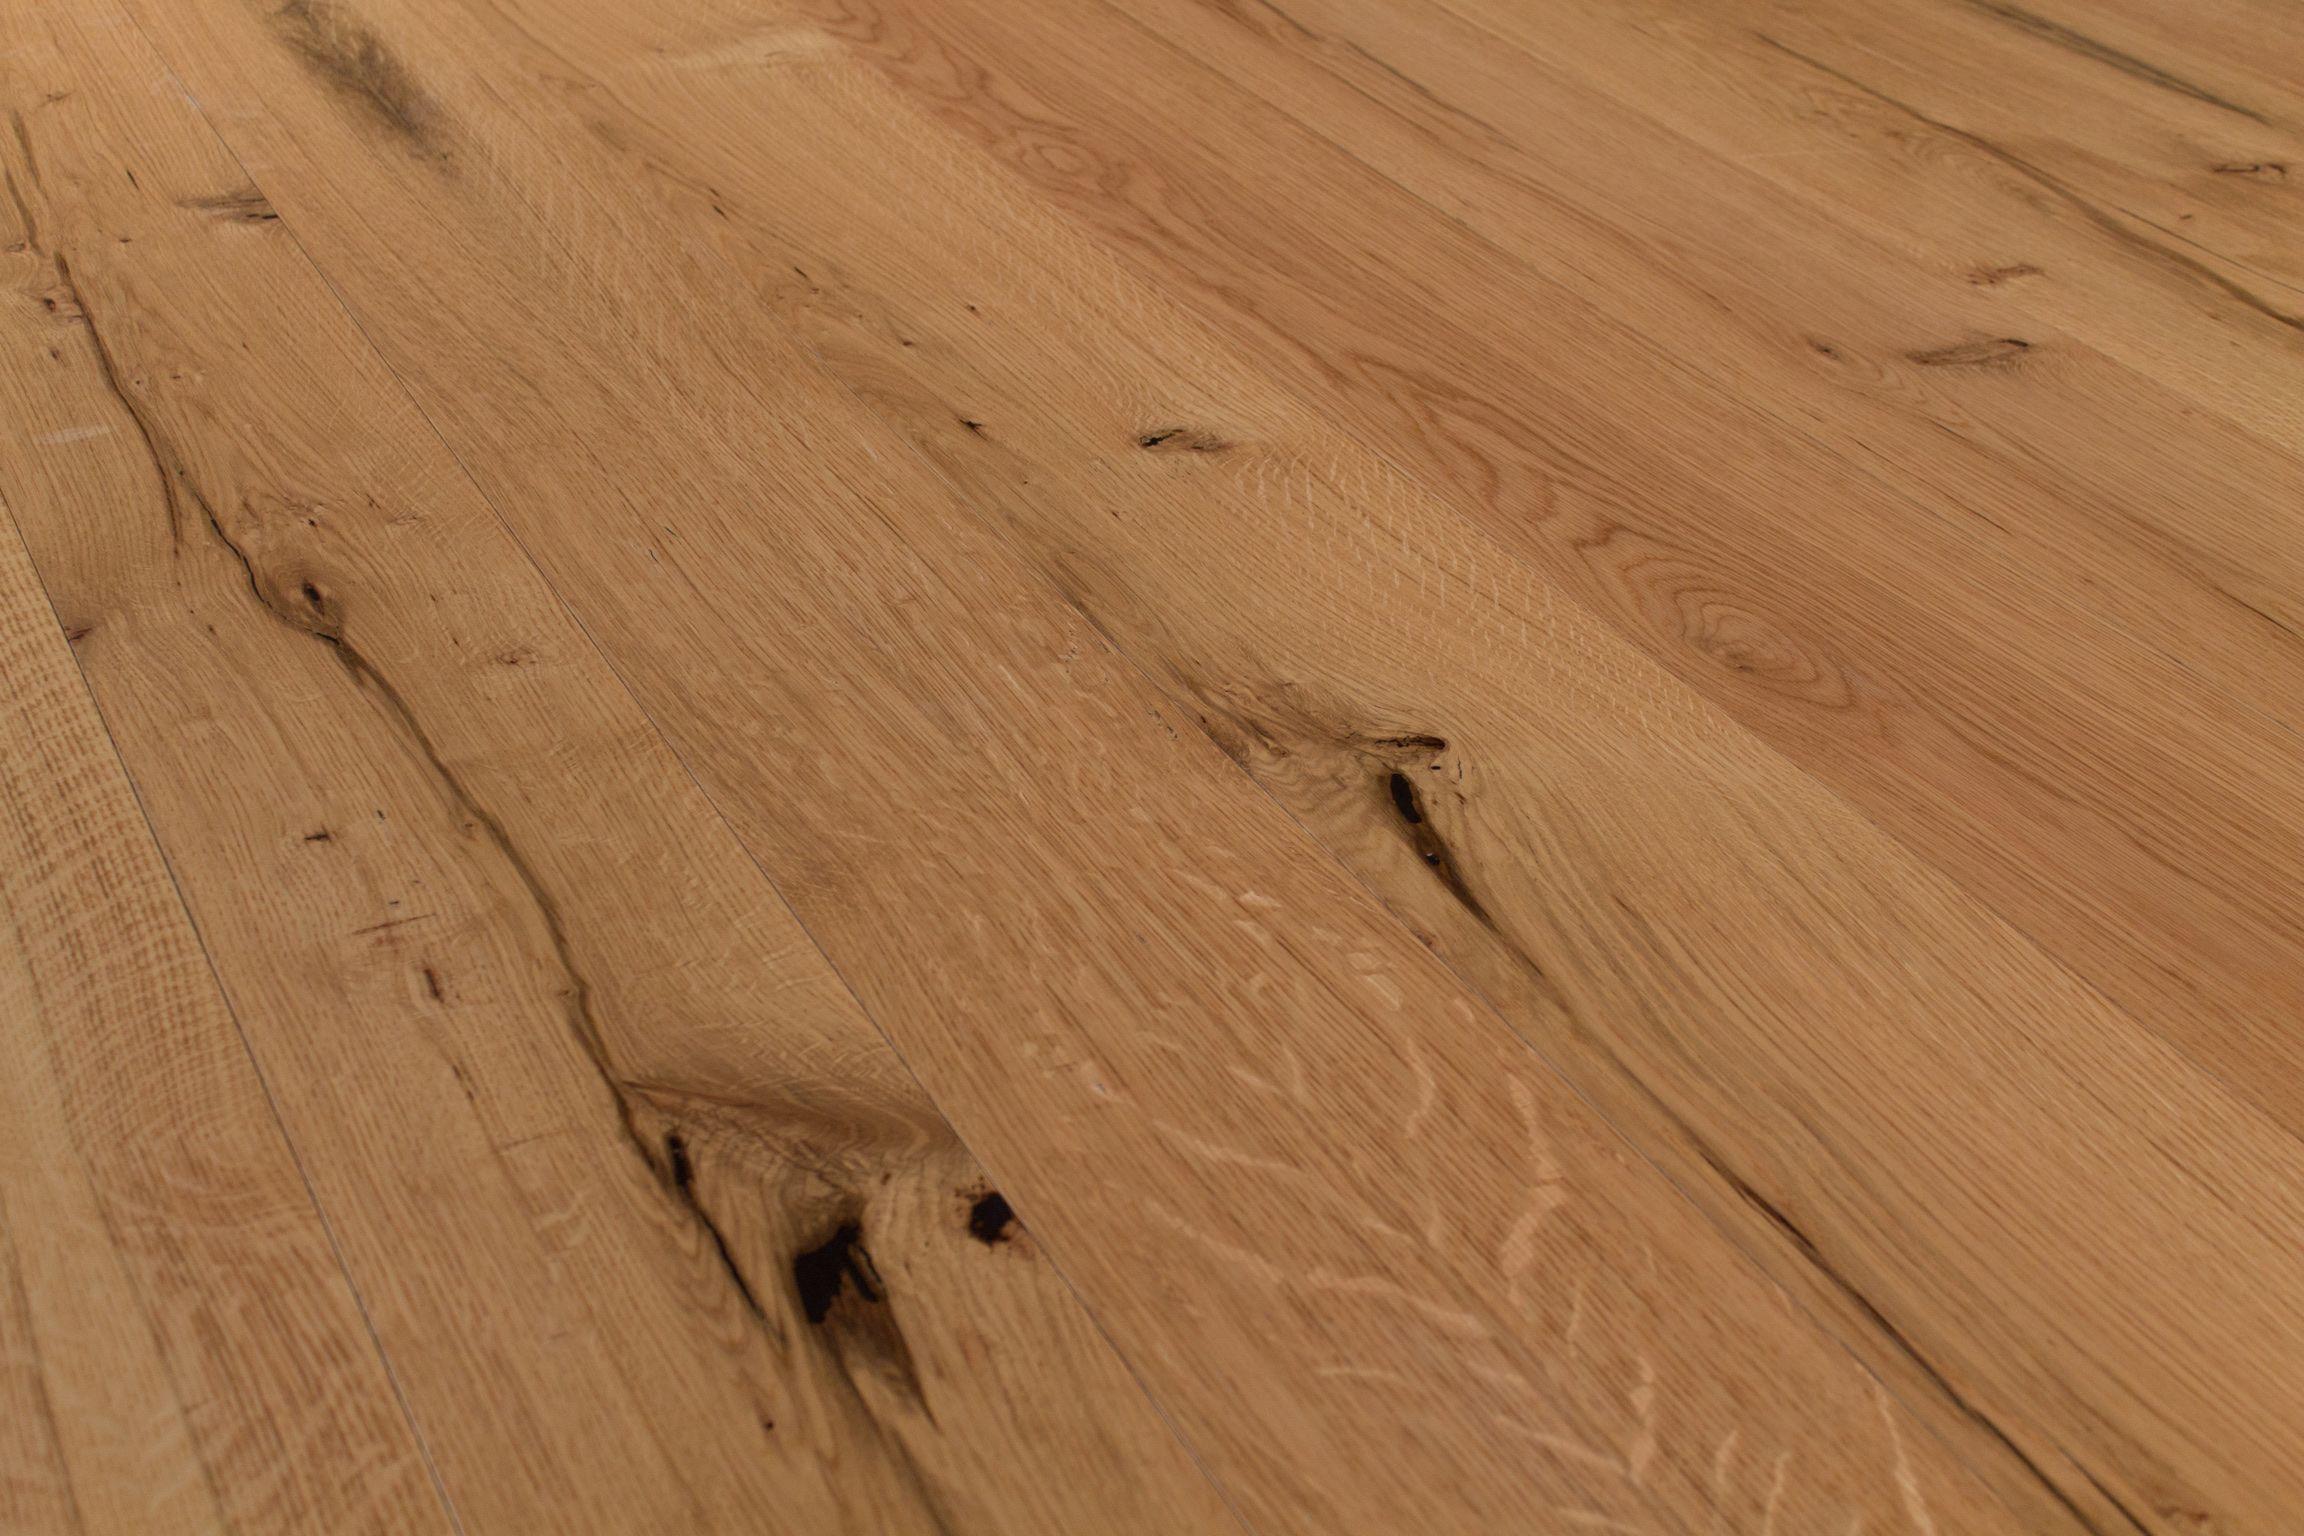 european canada floating easy image oak easyclip hardwood white sl easiklip flooring natural solid floors clip products floor